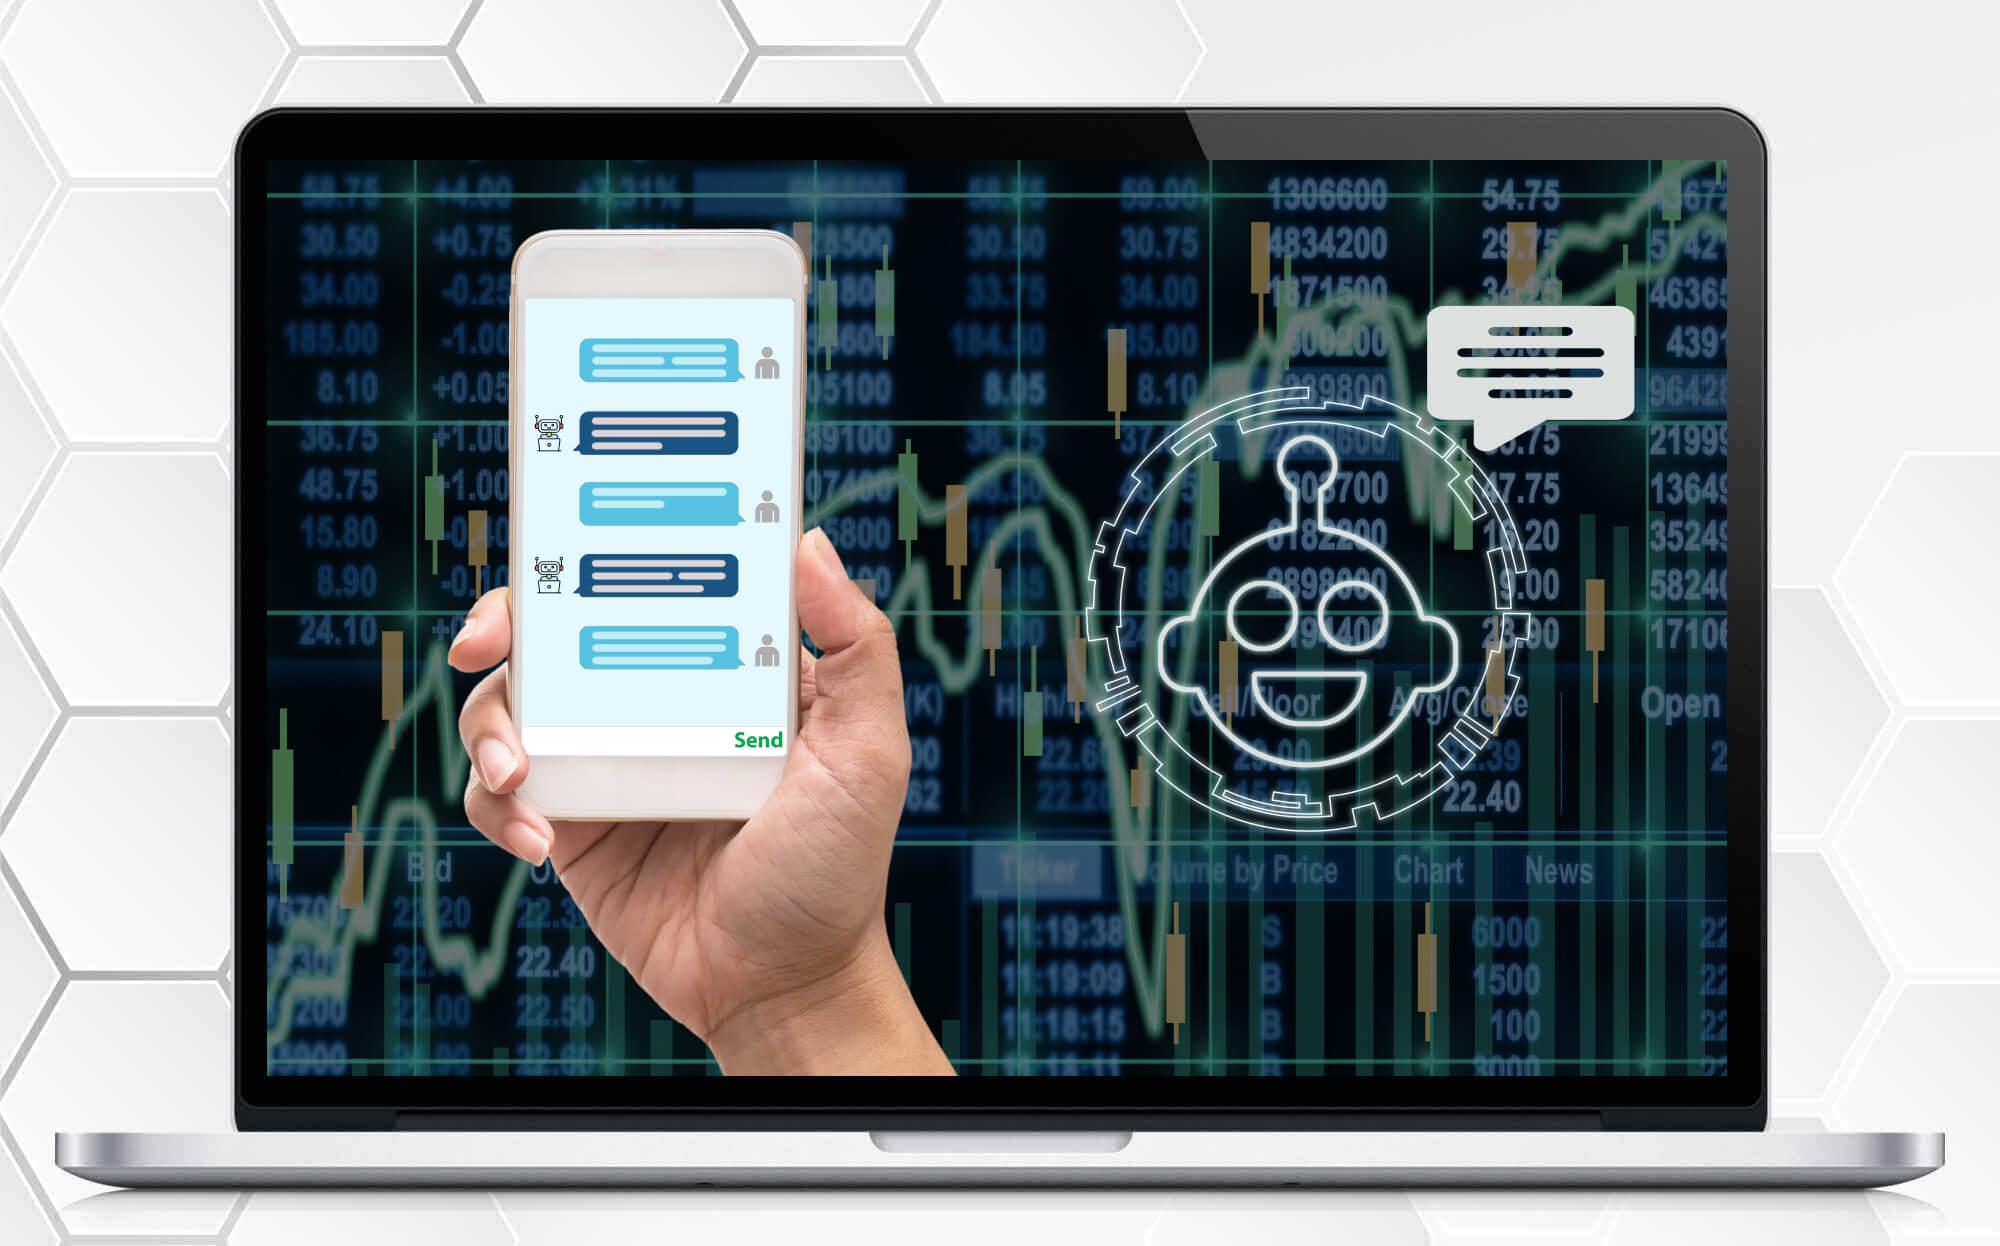 Chatbot Improves Customer Service